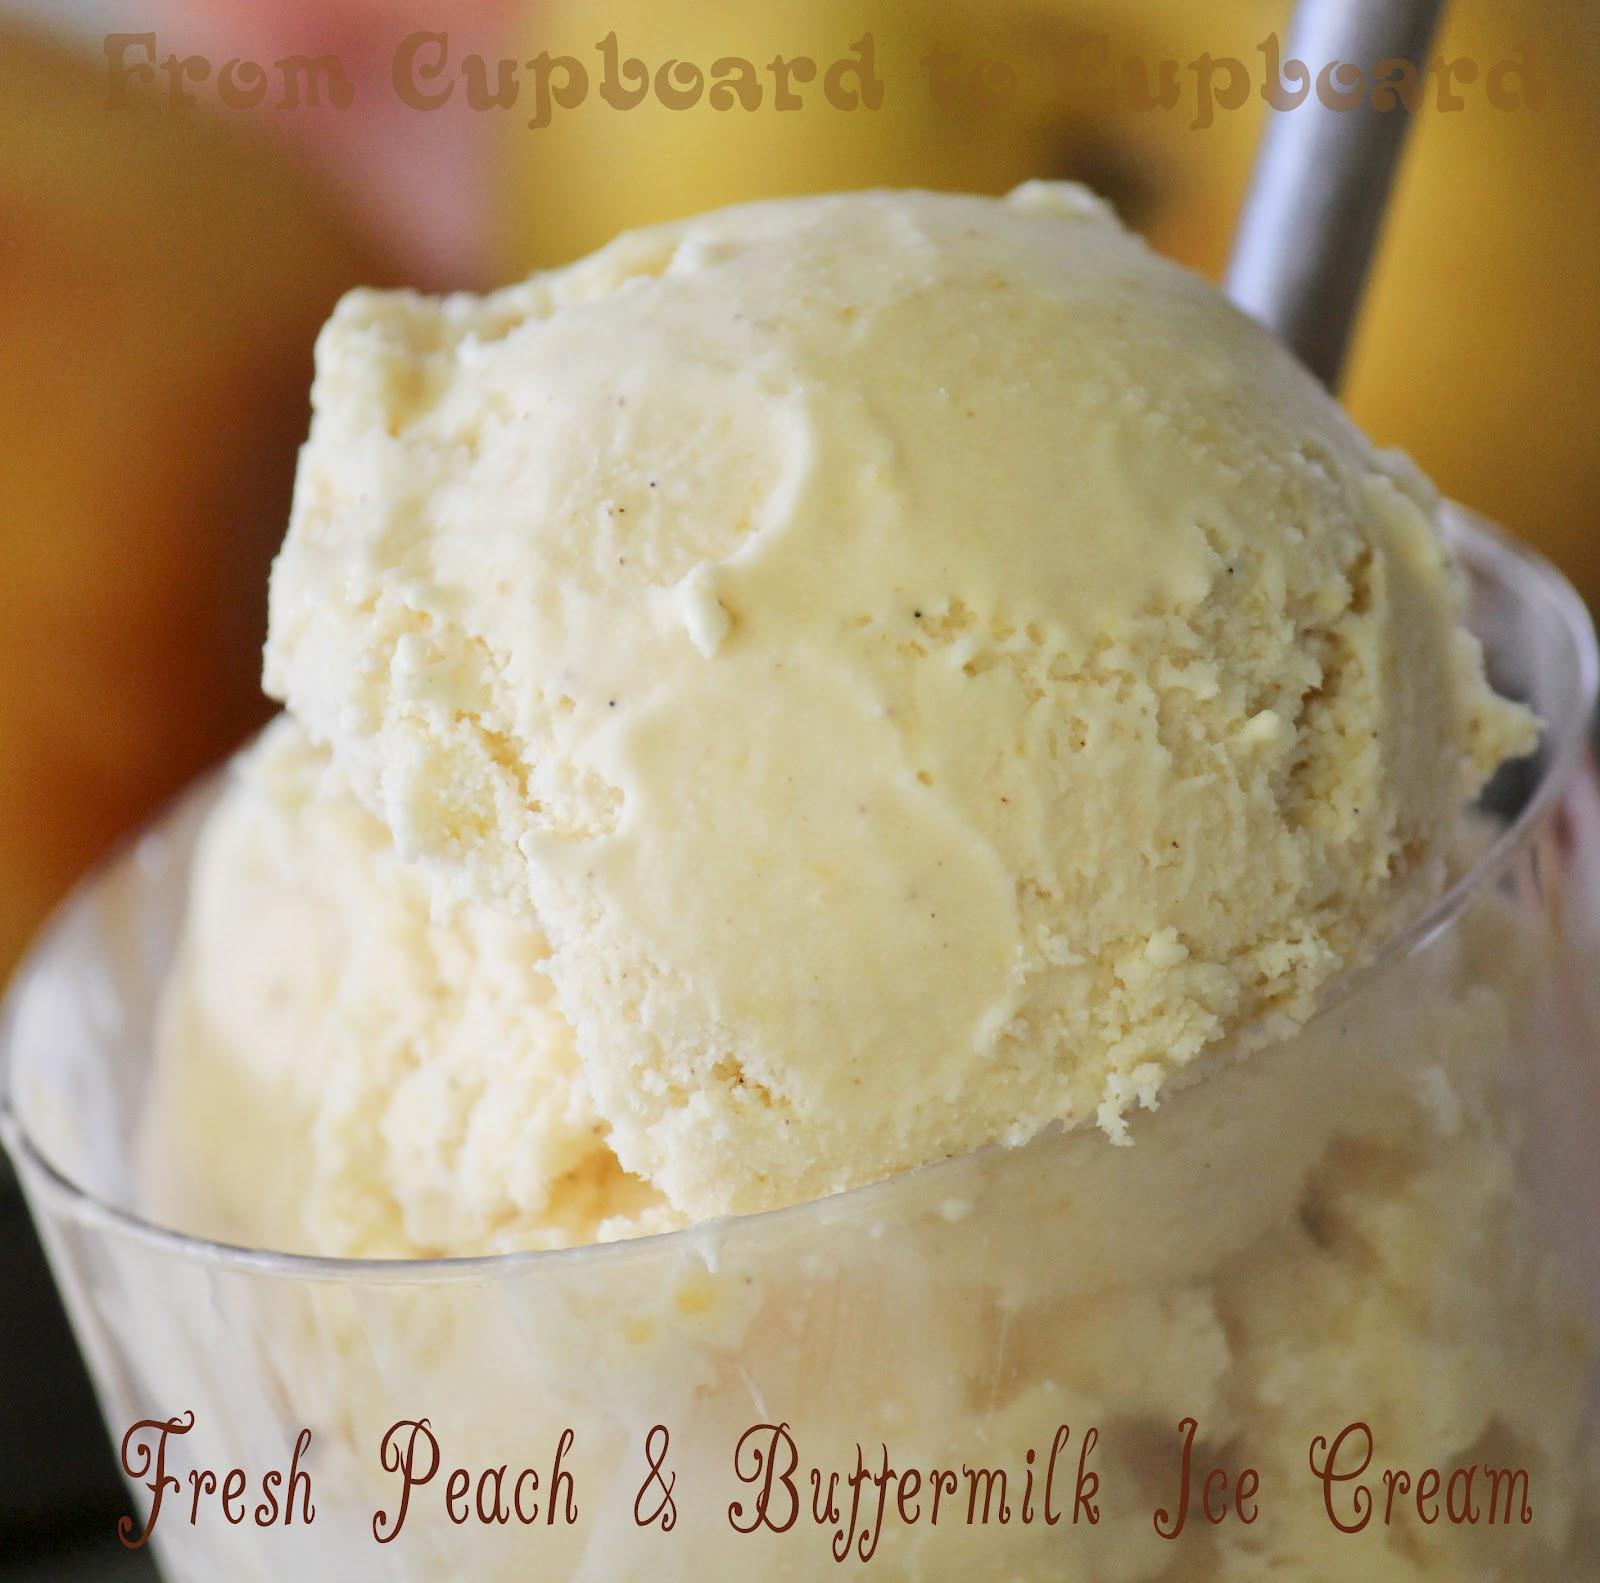 ... ice cream peach ice cream roasted strawberry and buttermilk ice cream